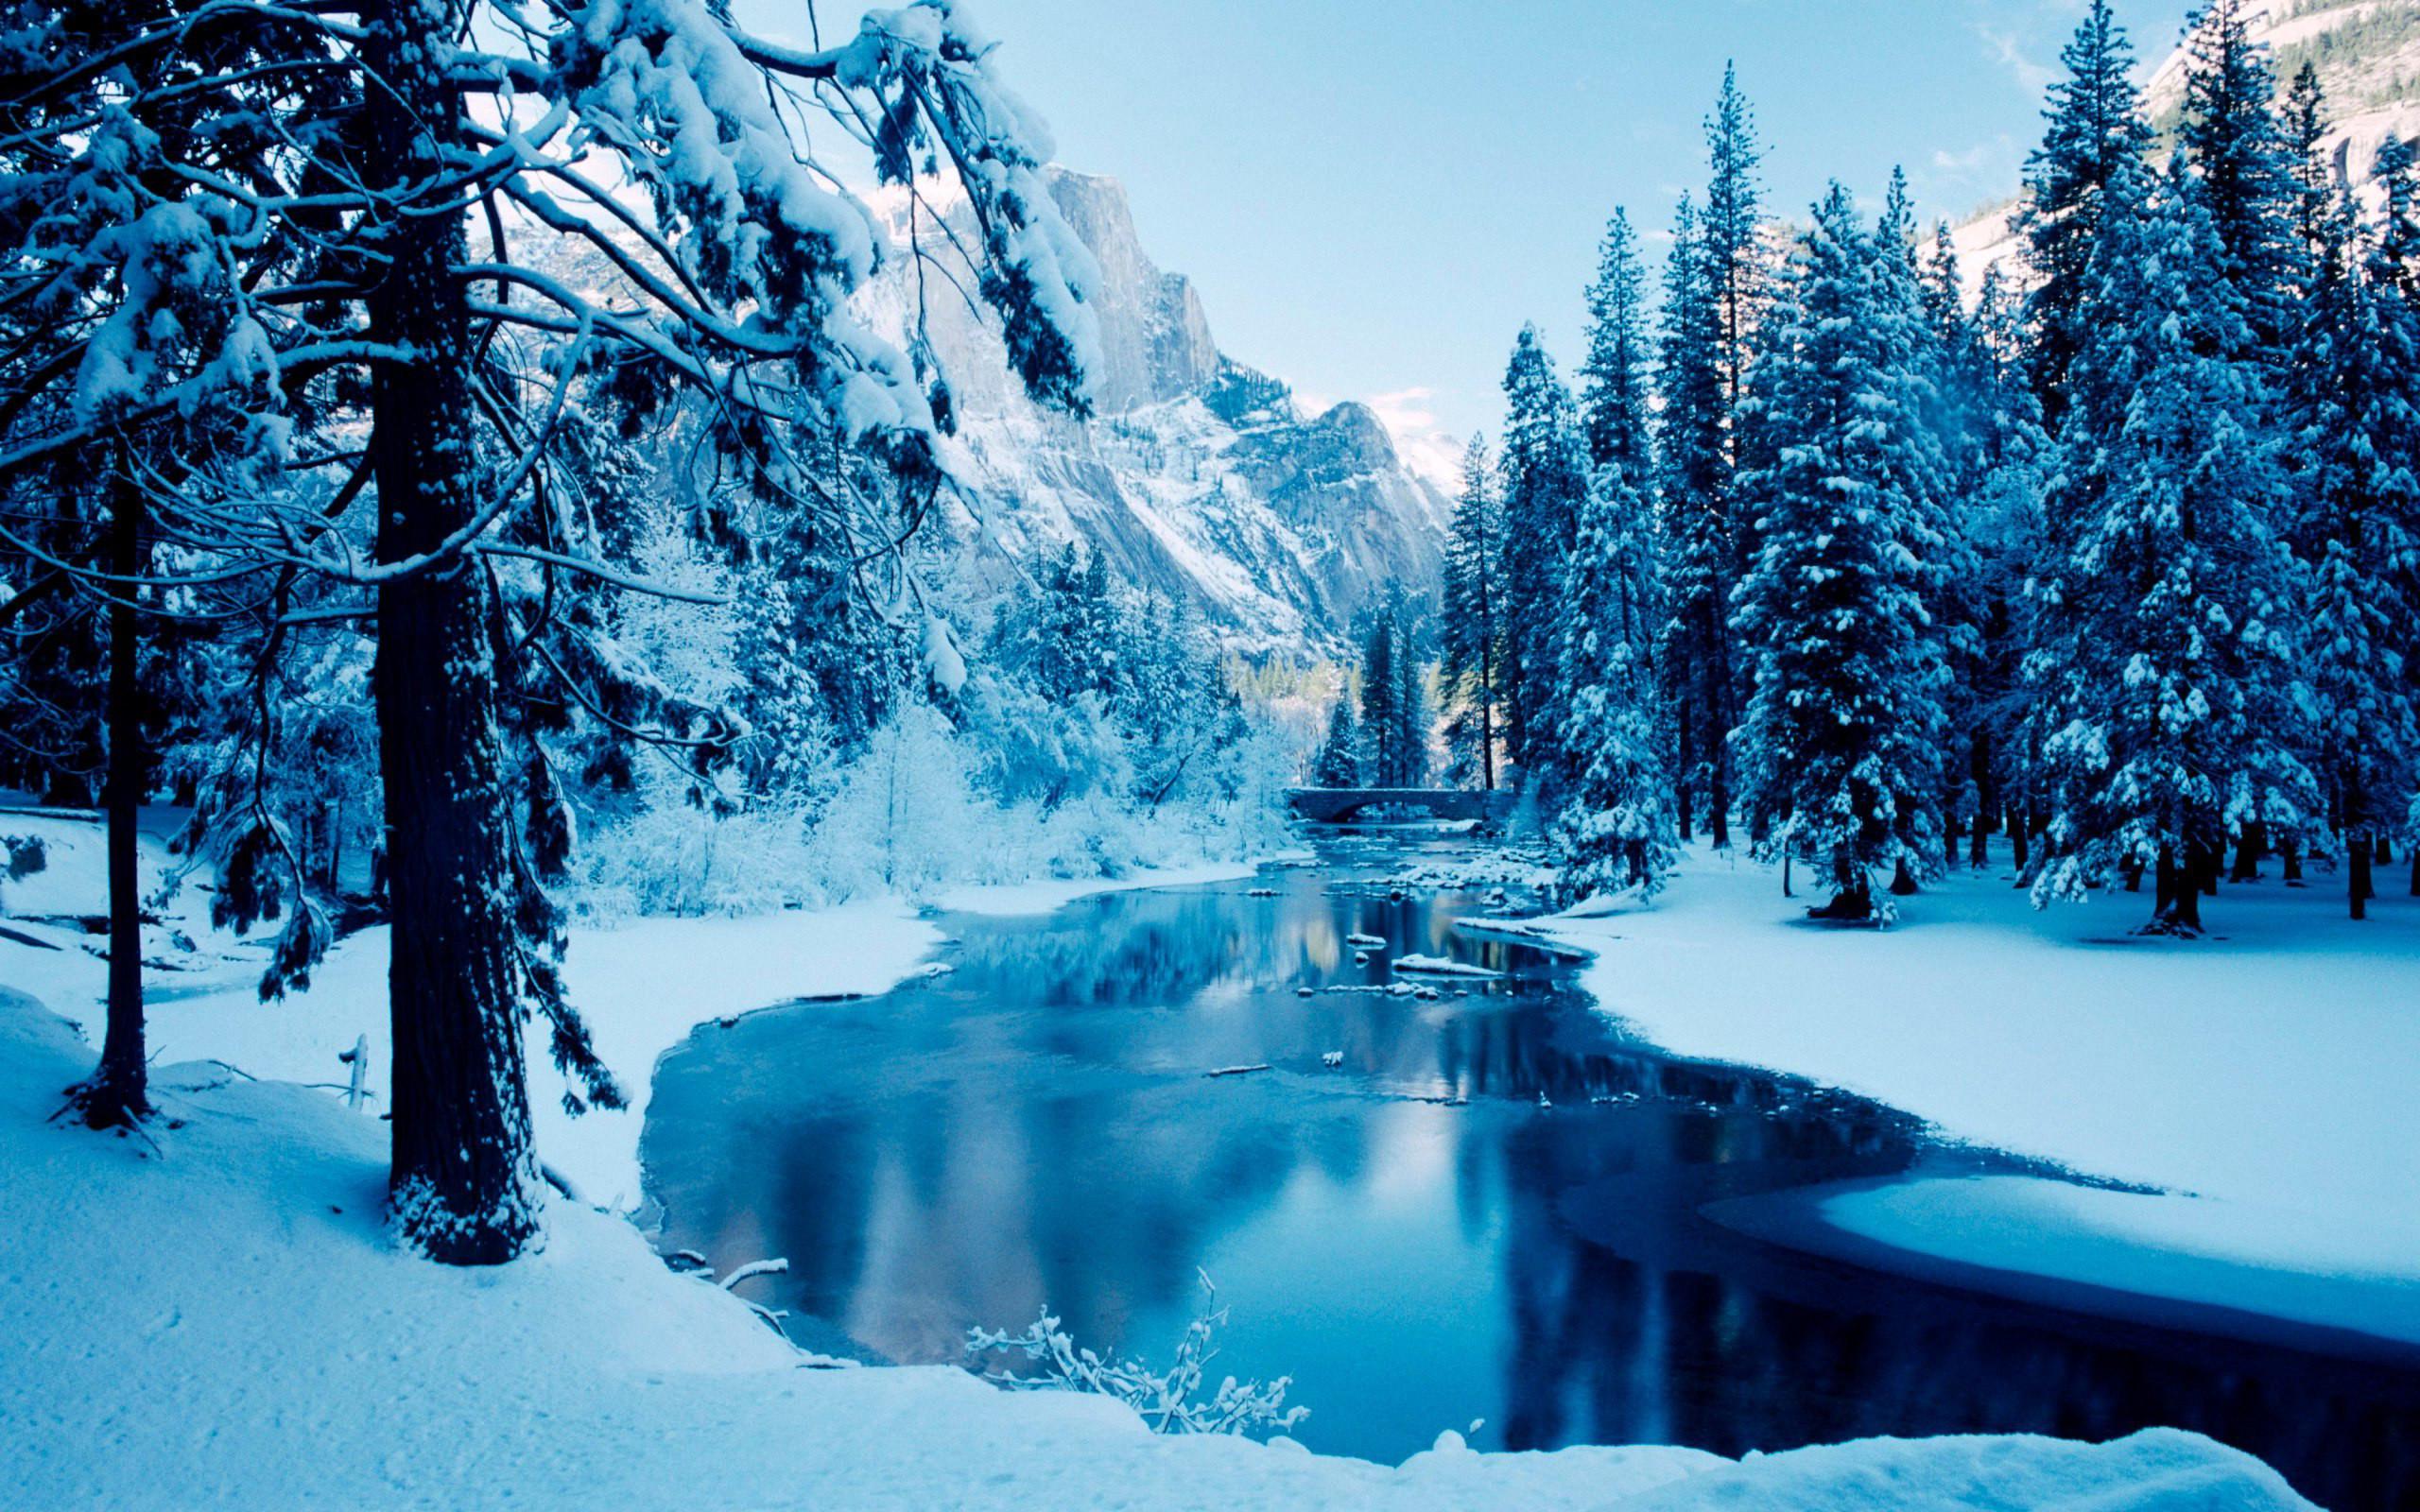 13, 2015 By Stephen Comments Off on Winter Scenes Desktop Wallpaper .